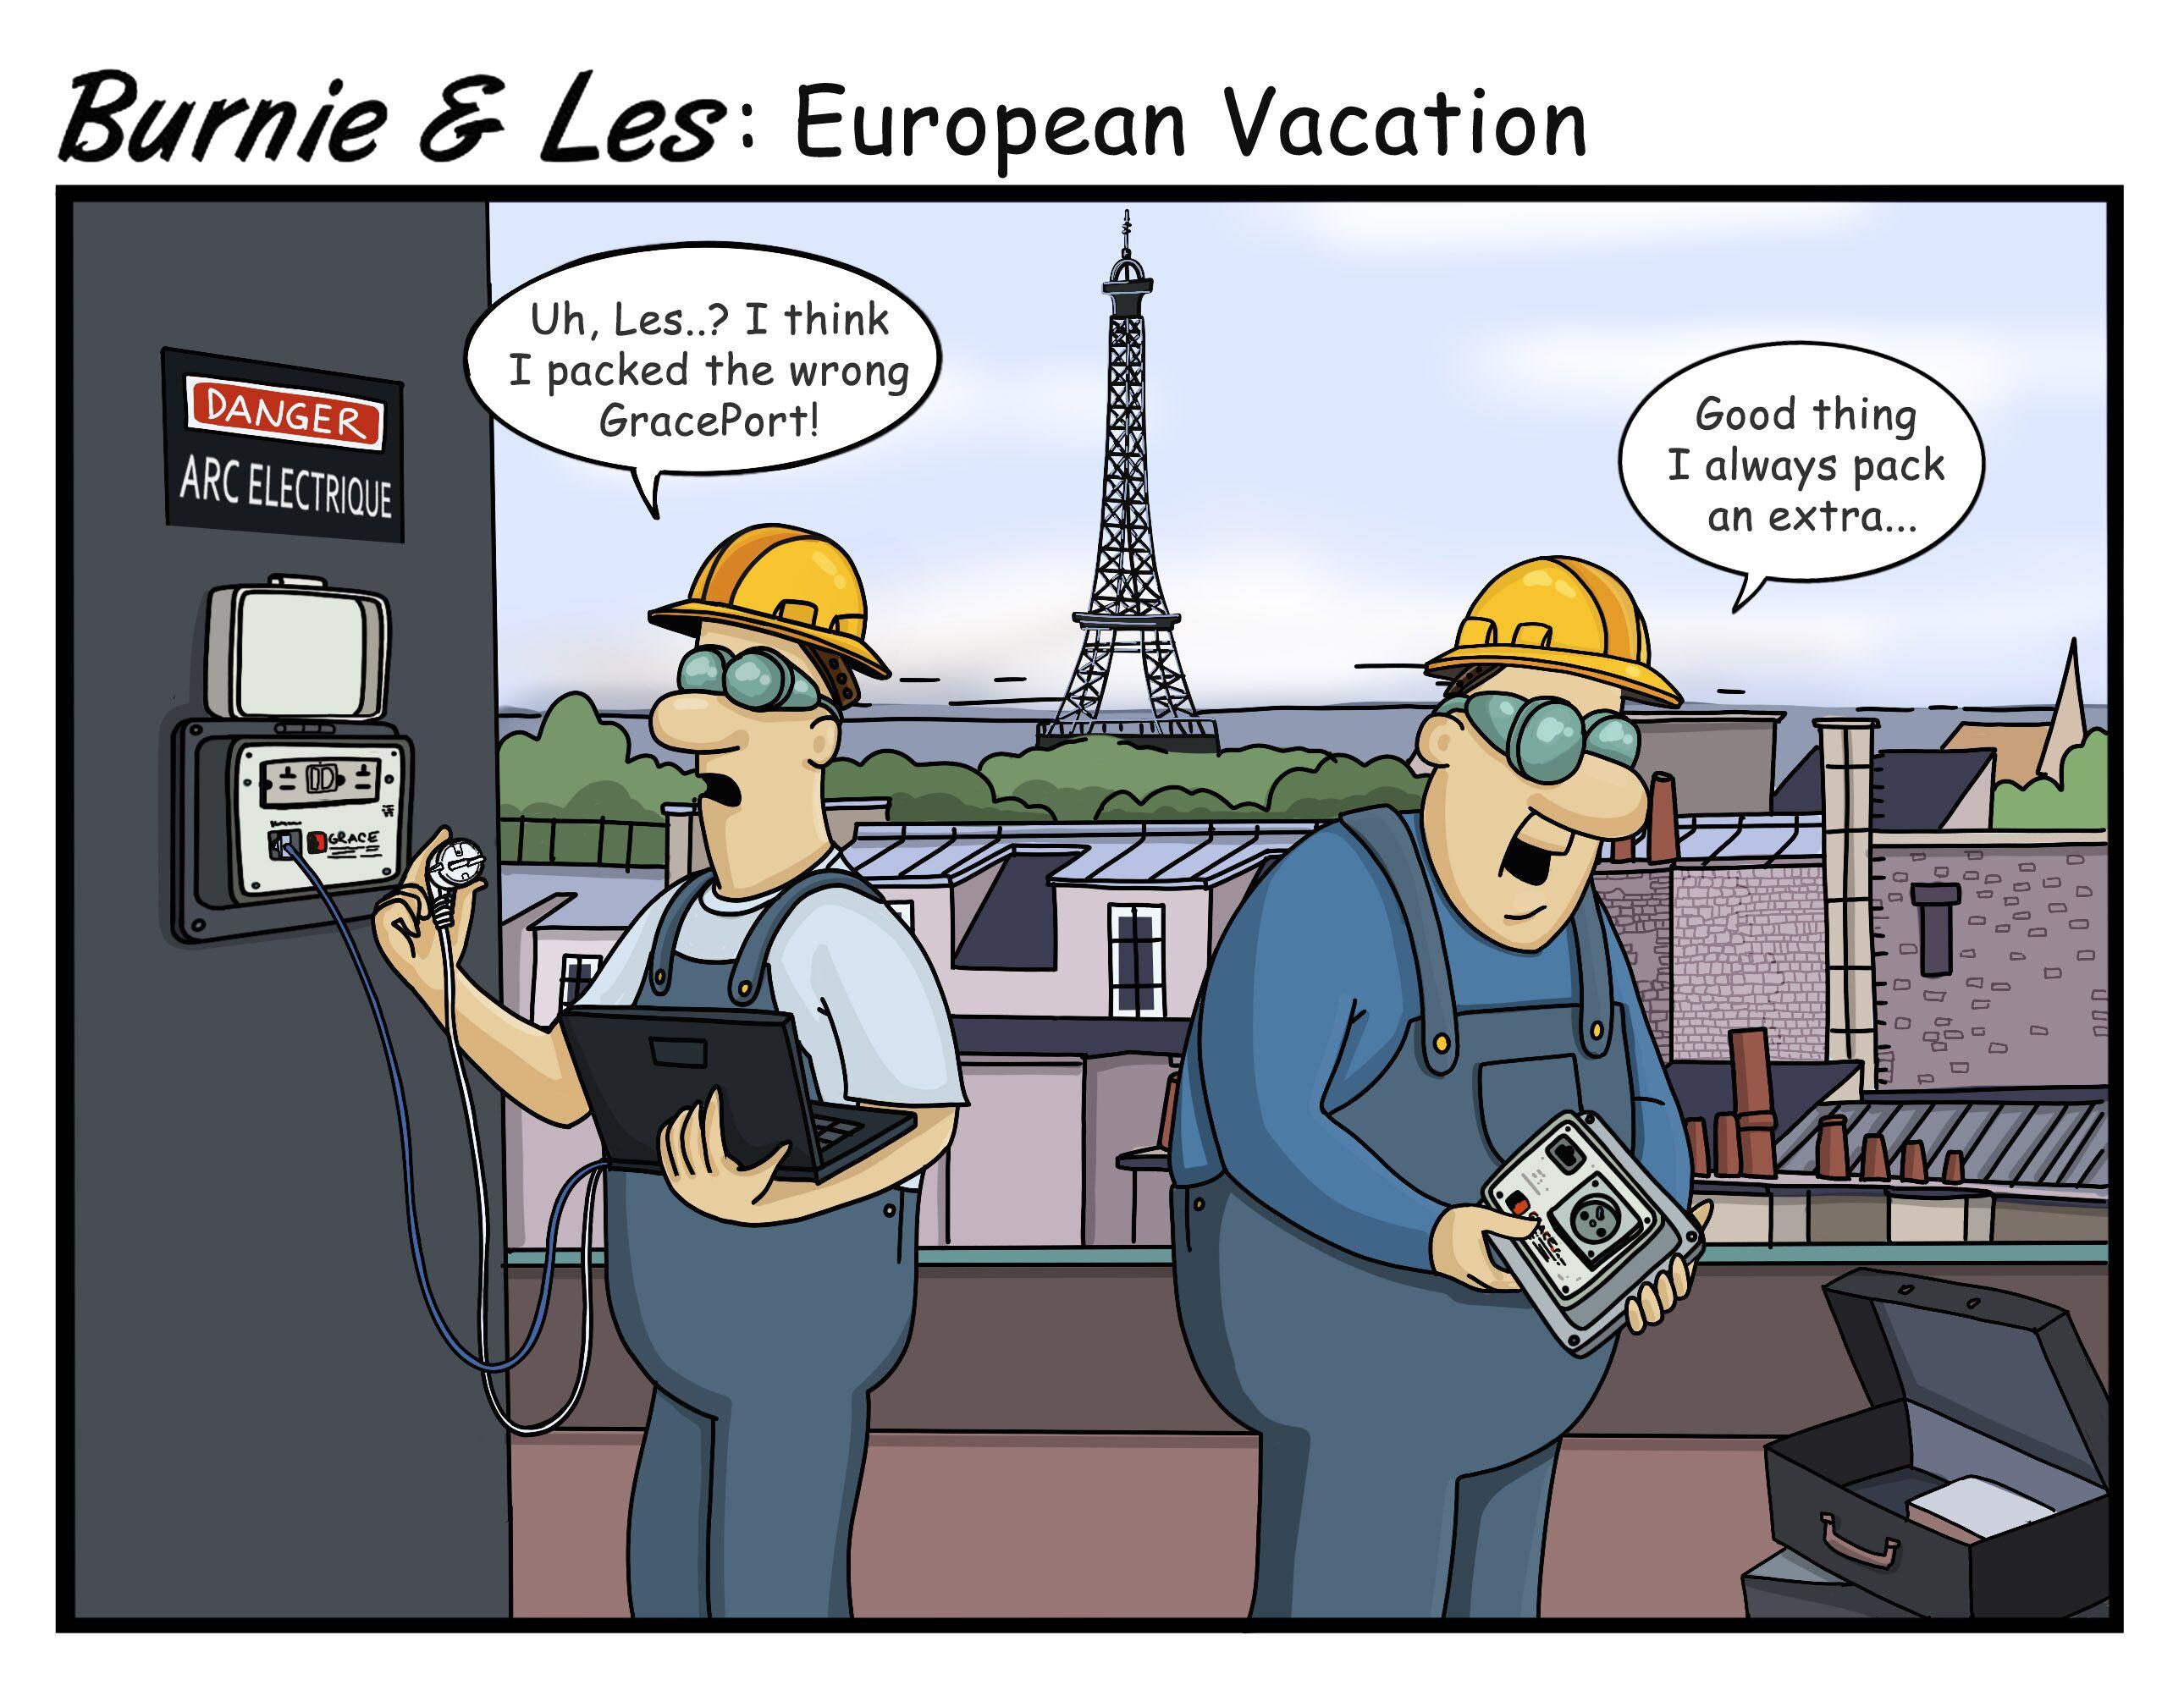 Burnie and Les Europe white